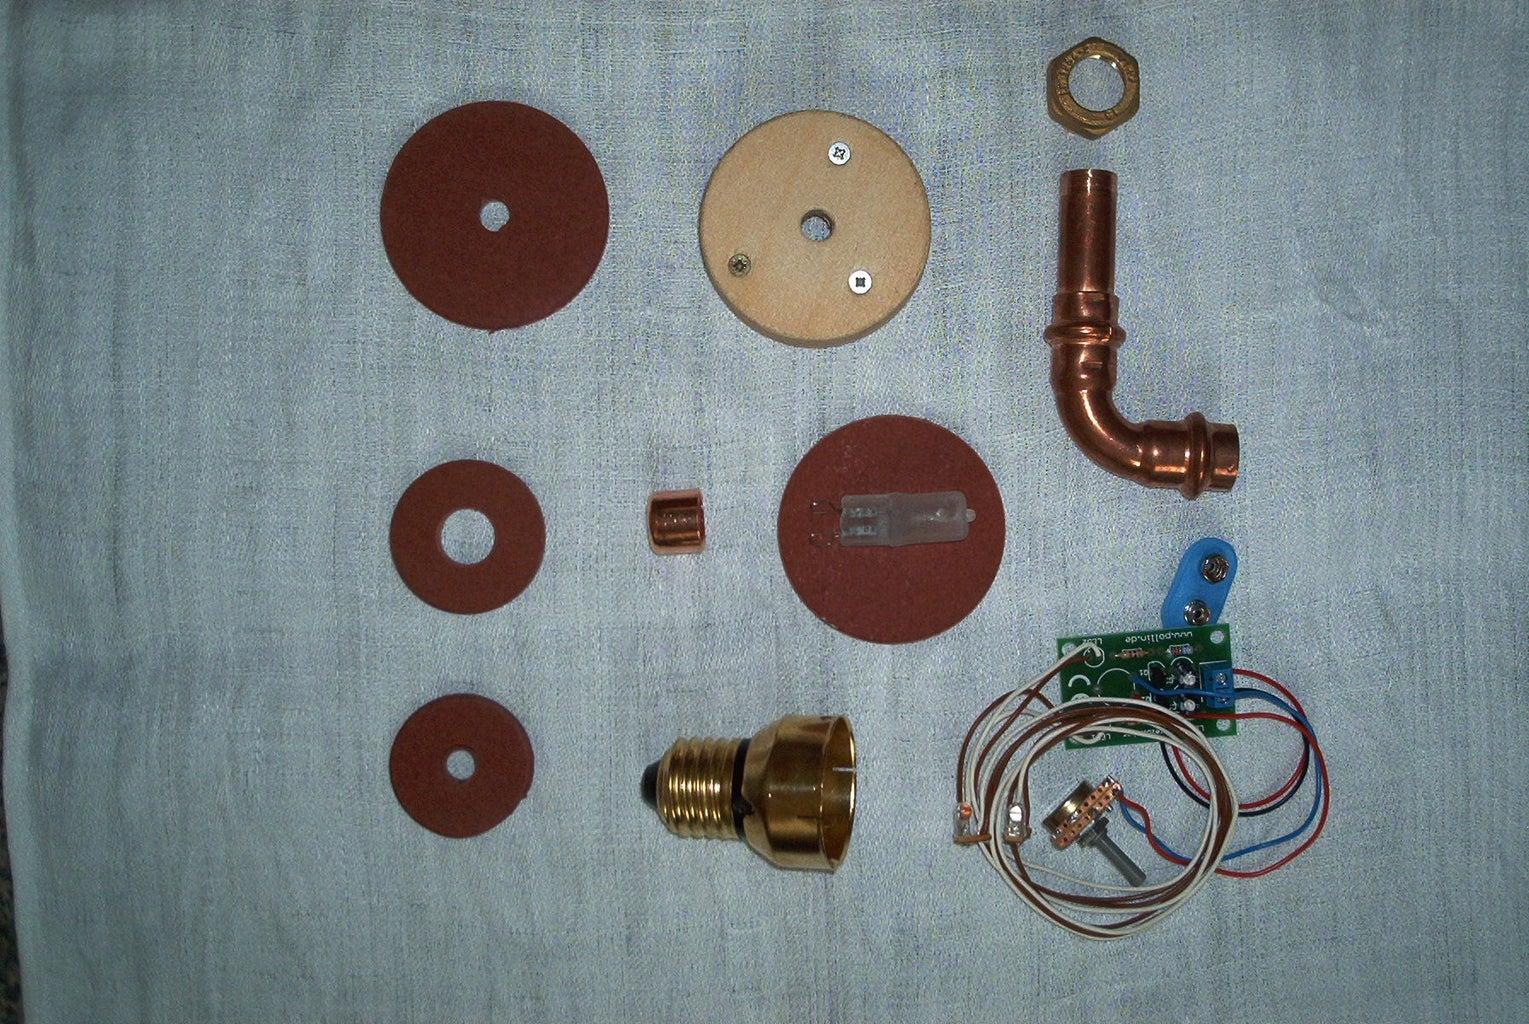 Parts in Details